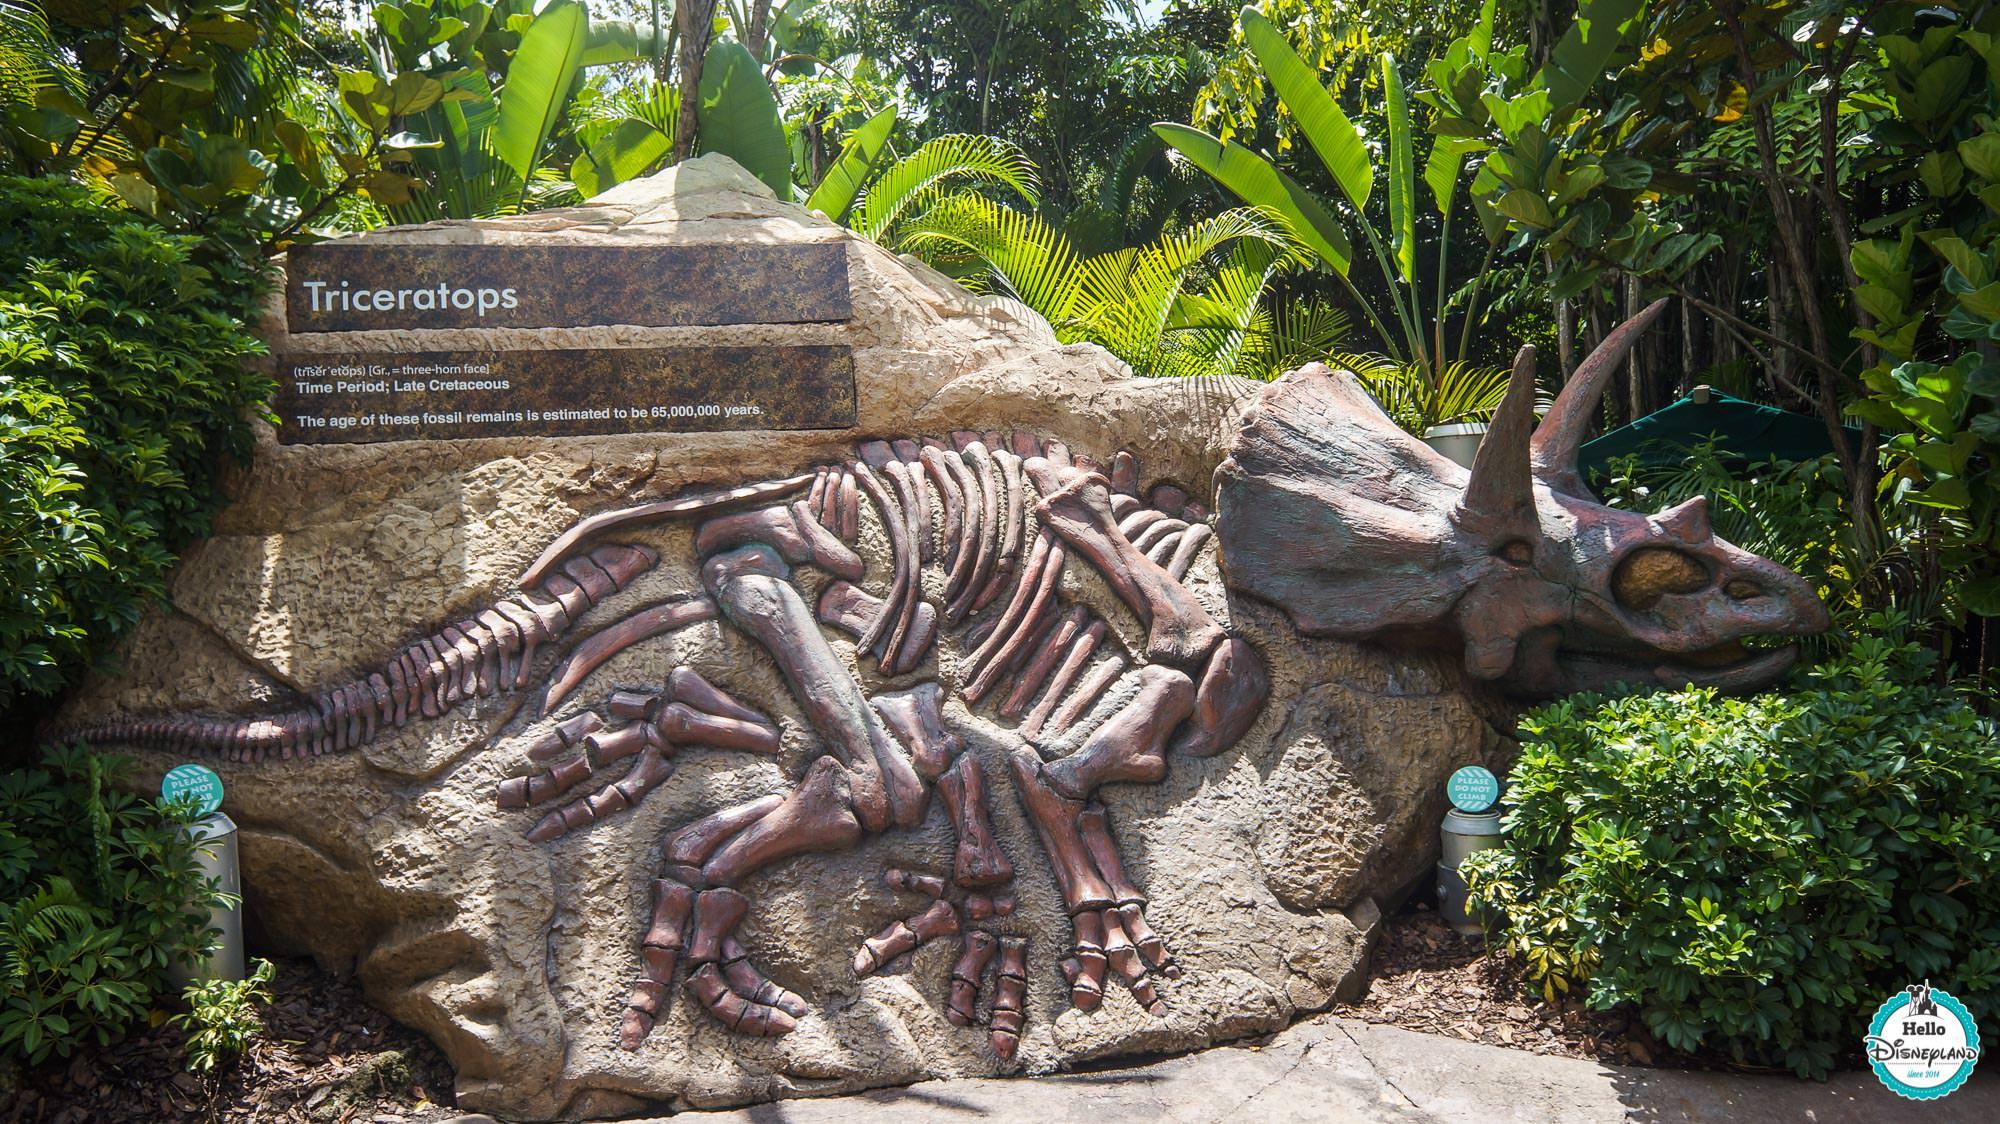 Universal Orlando Resort - Jurassic Park